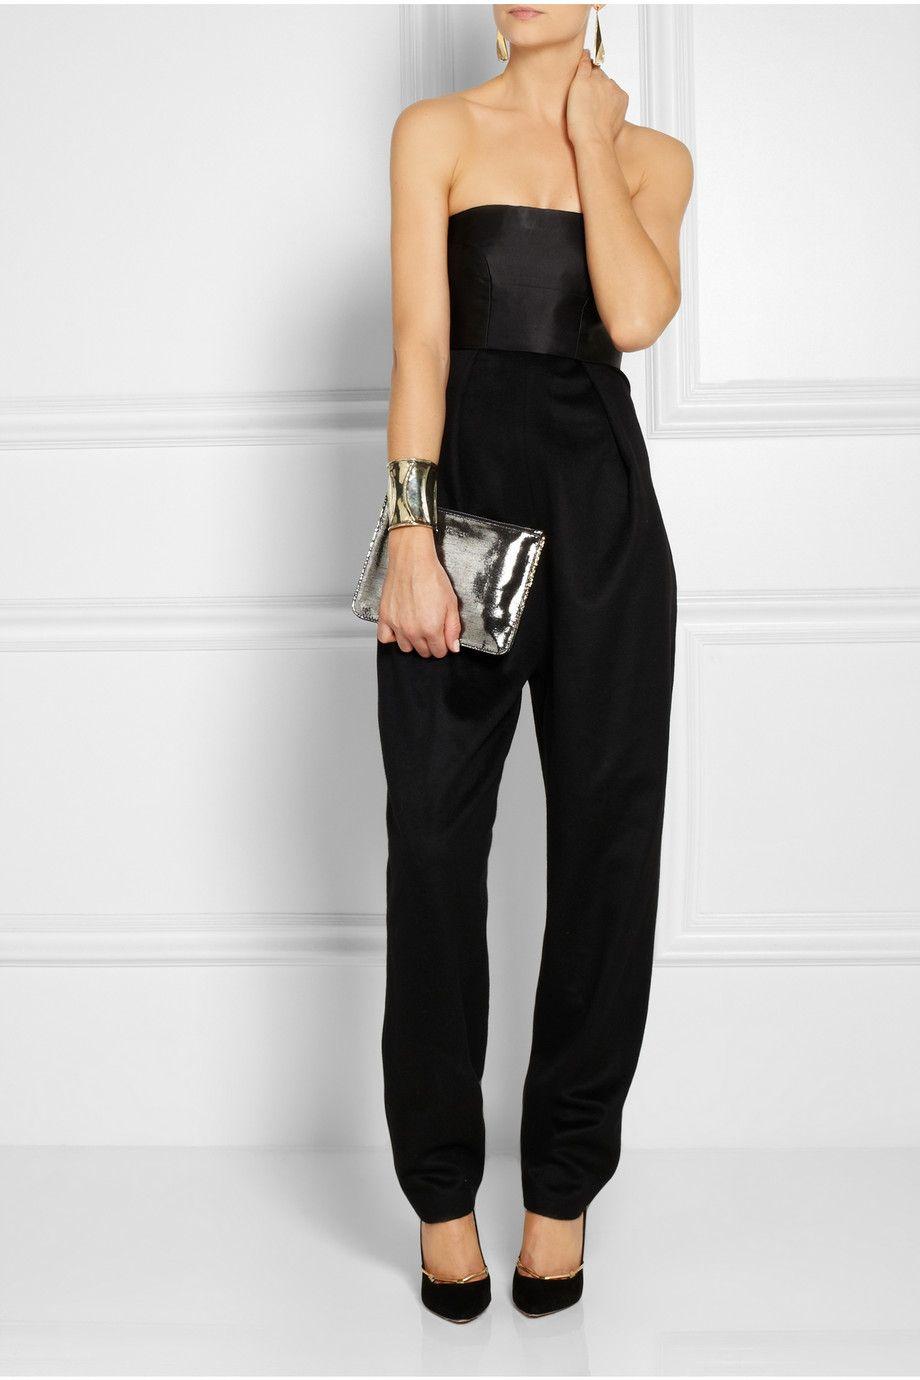 Alexander McQueen|Two-tone metallic leather pouch|NET-A-PORTER.COM